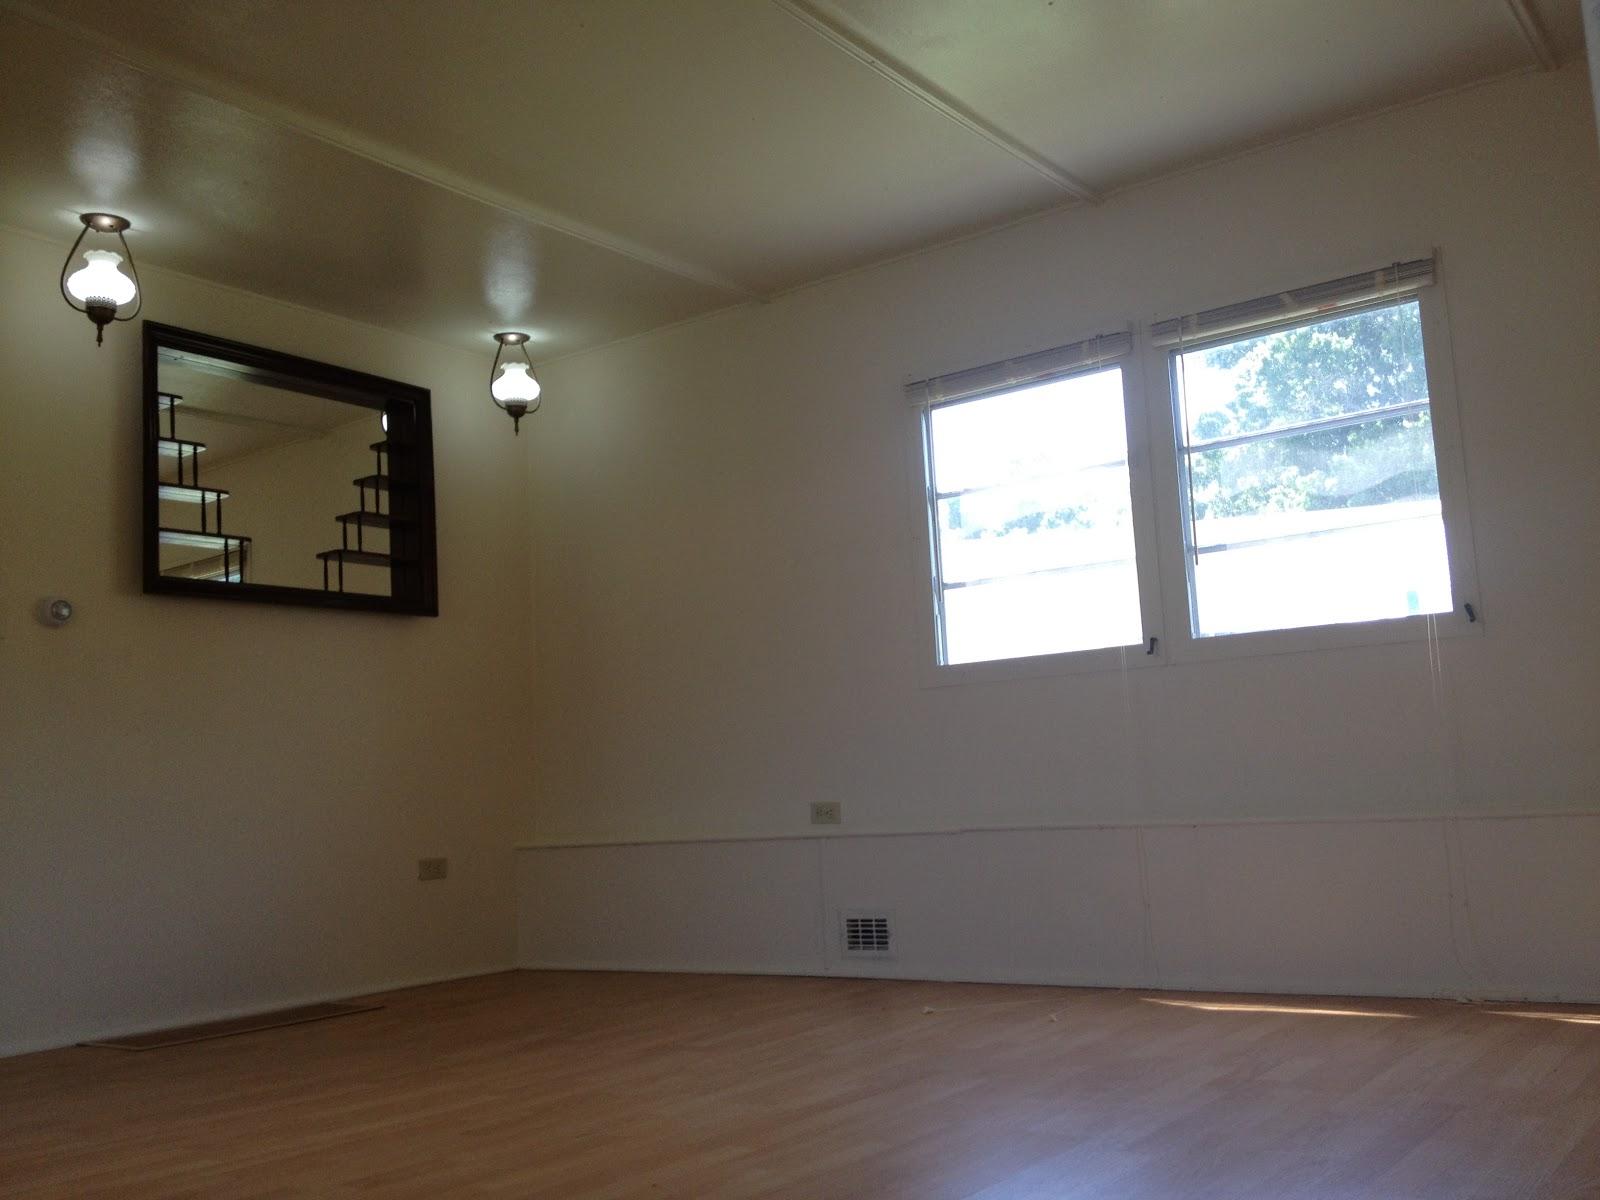 trail villa sold 2 bedroom 2 bath mobile home for sale 8 000